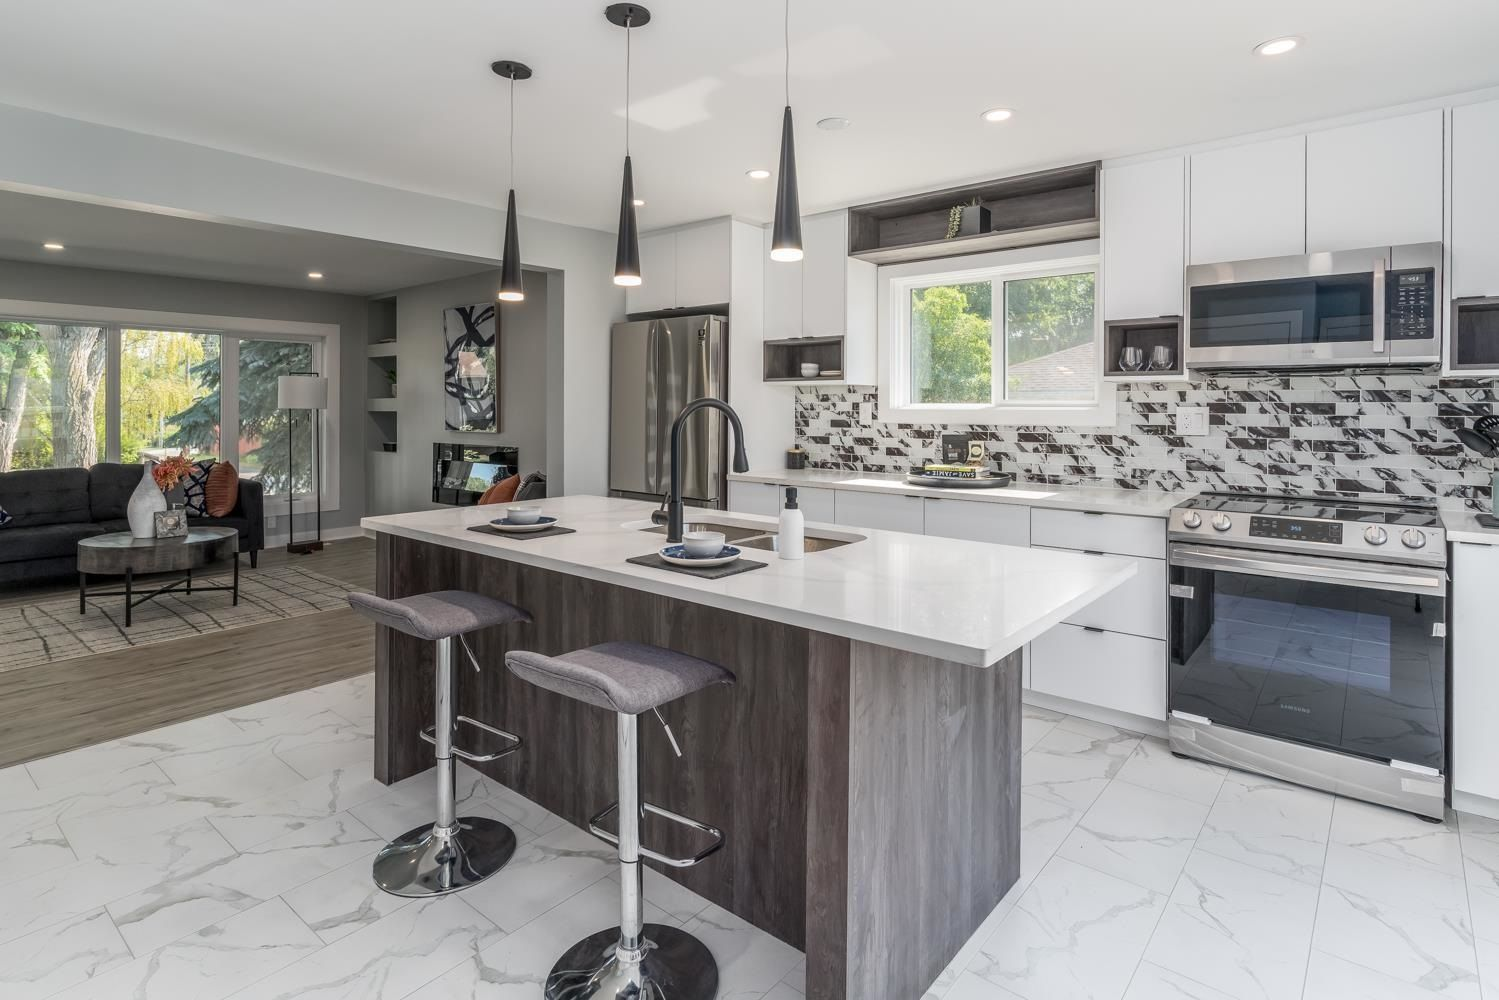 Main Photo: 13536 117 Avenue in Edmonton: Zone 07 House for sale : MLS®# E4256312